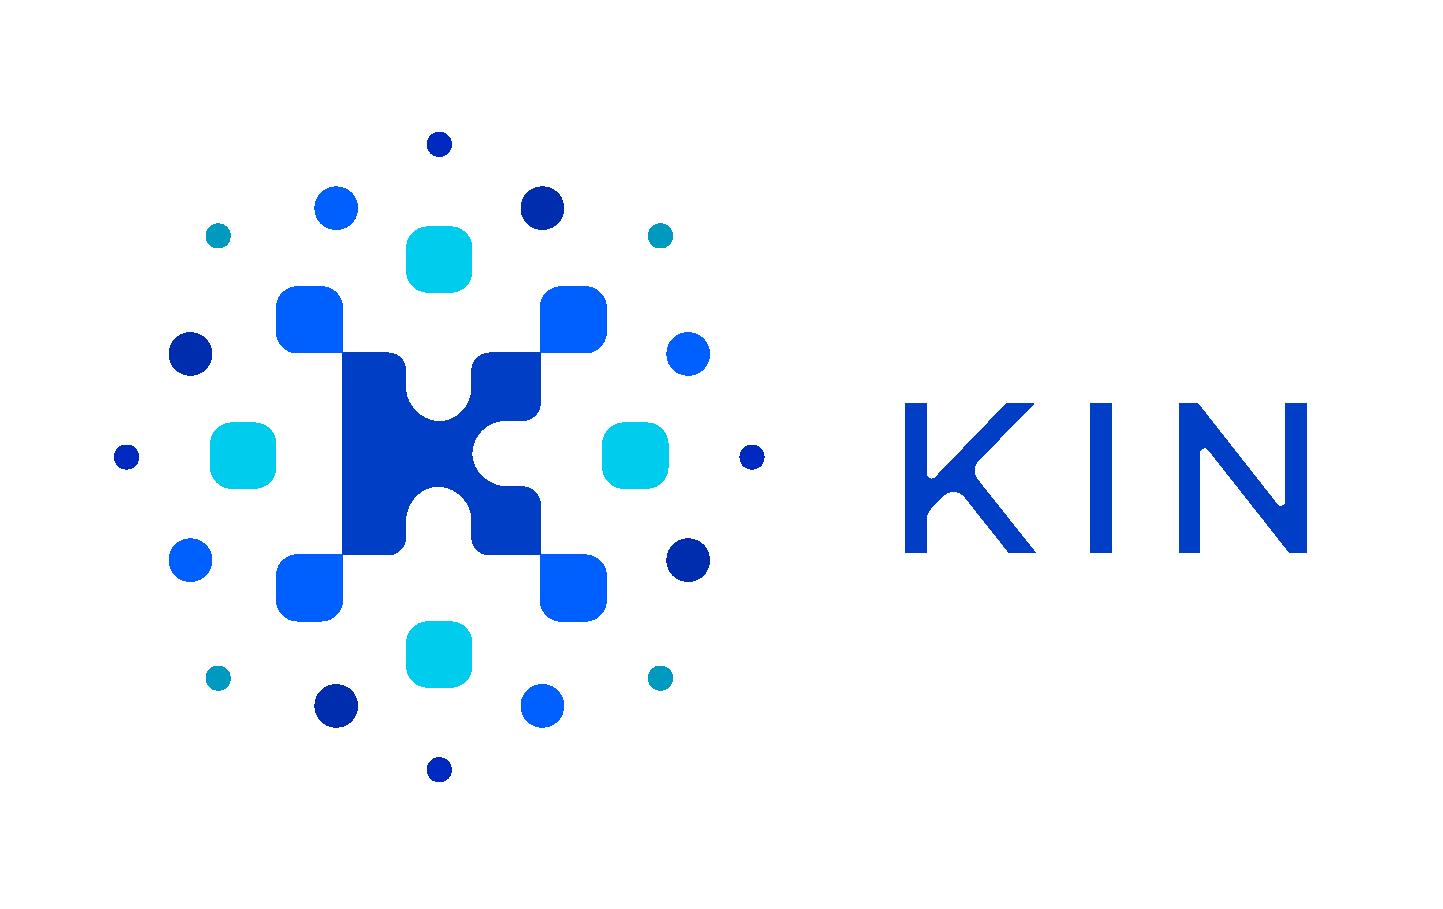 Global chat platform Kik to launch digital currency